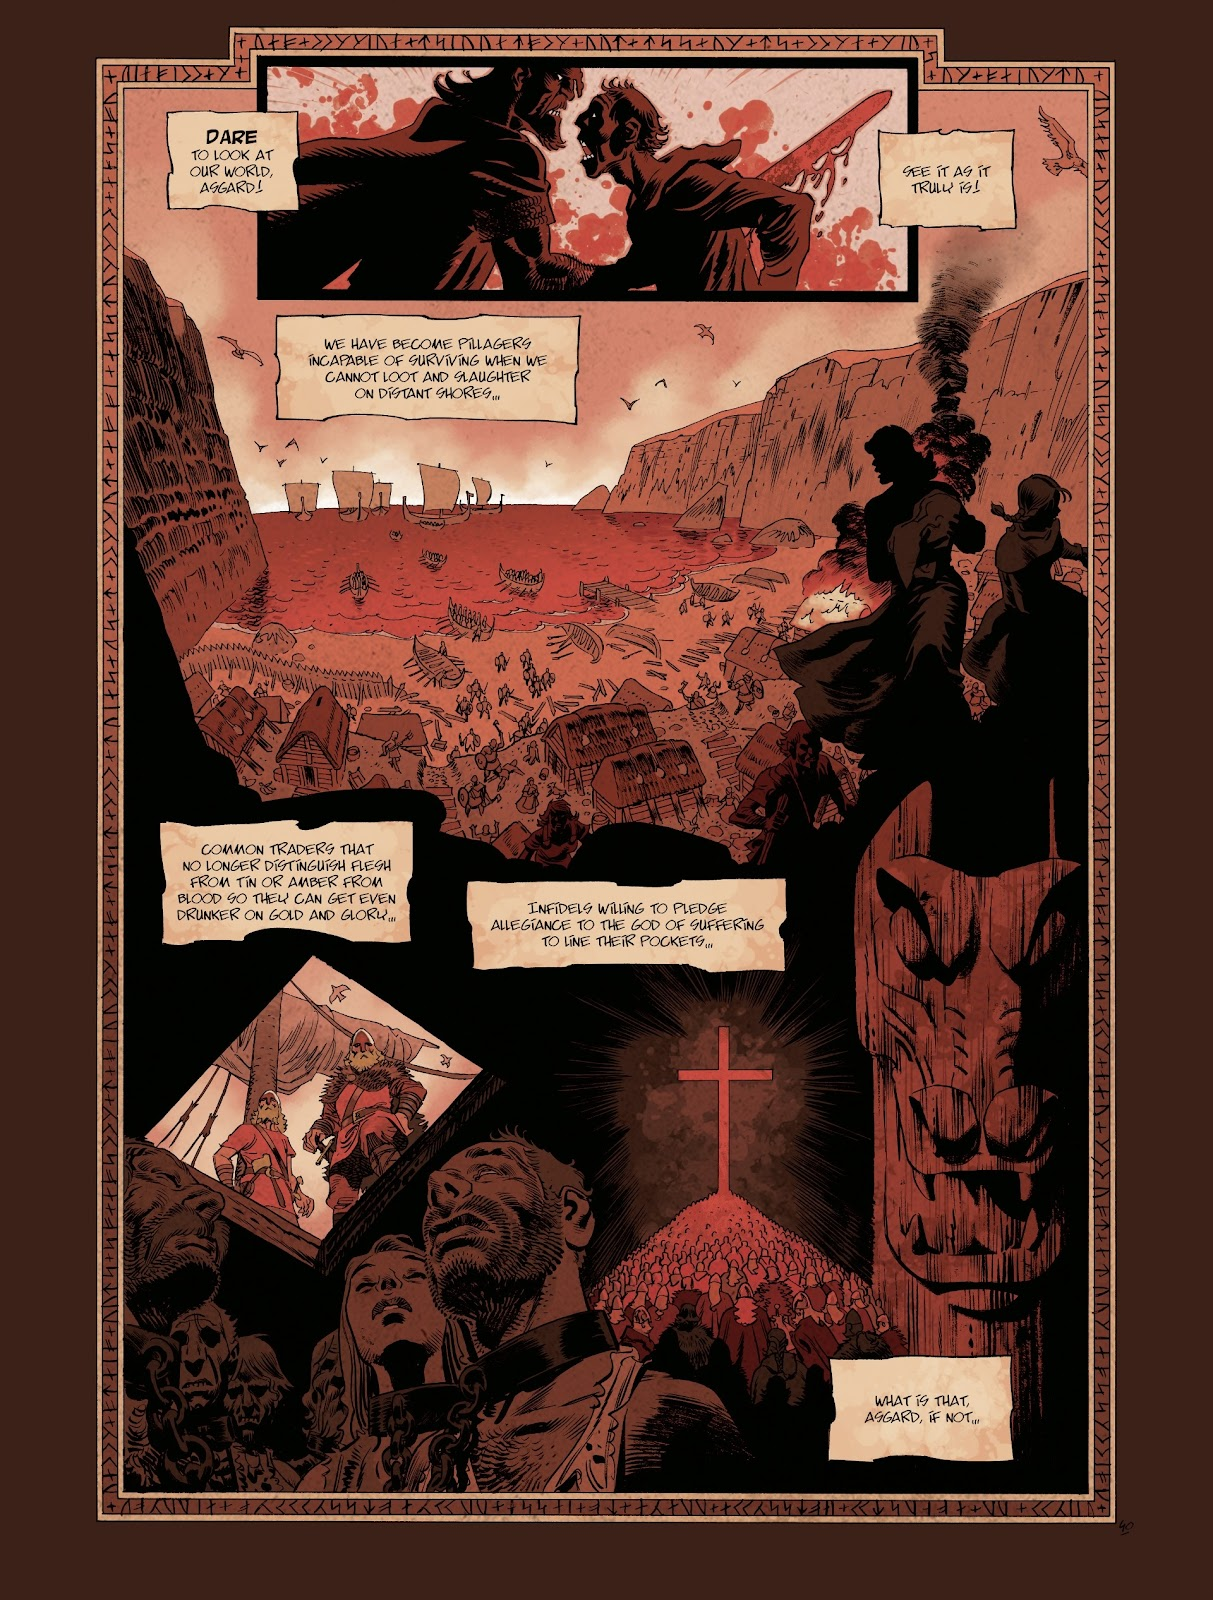 Read online Asgard comic -  Issue #1 - 44